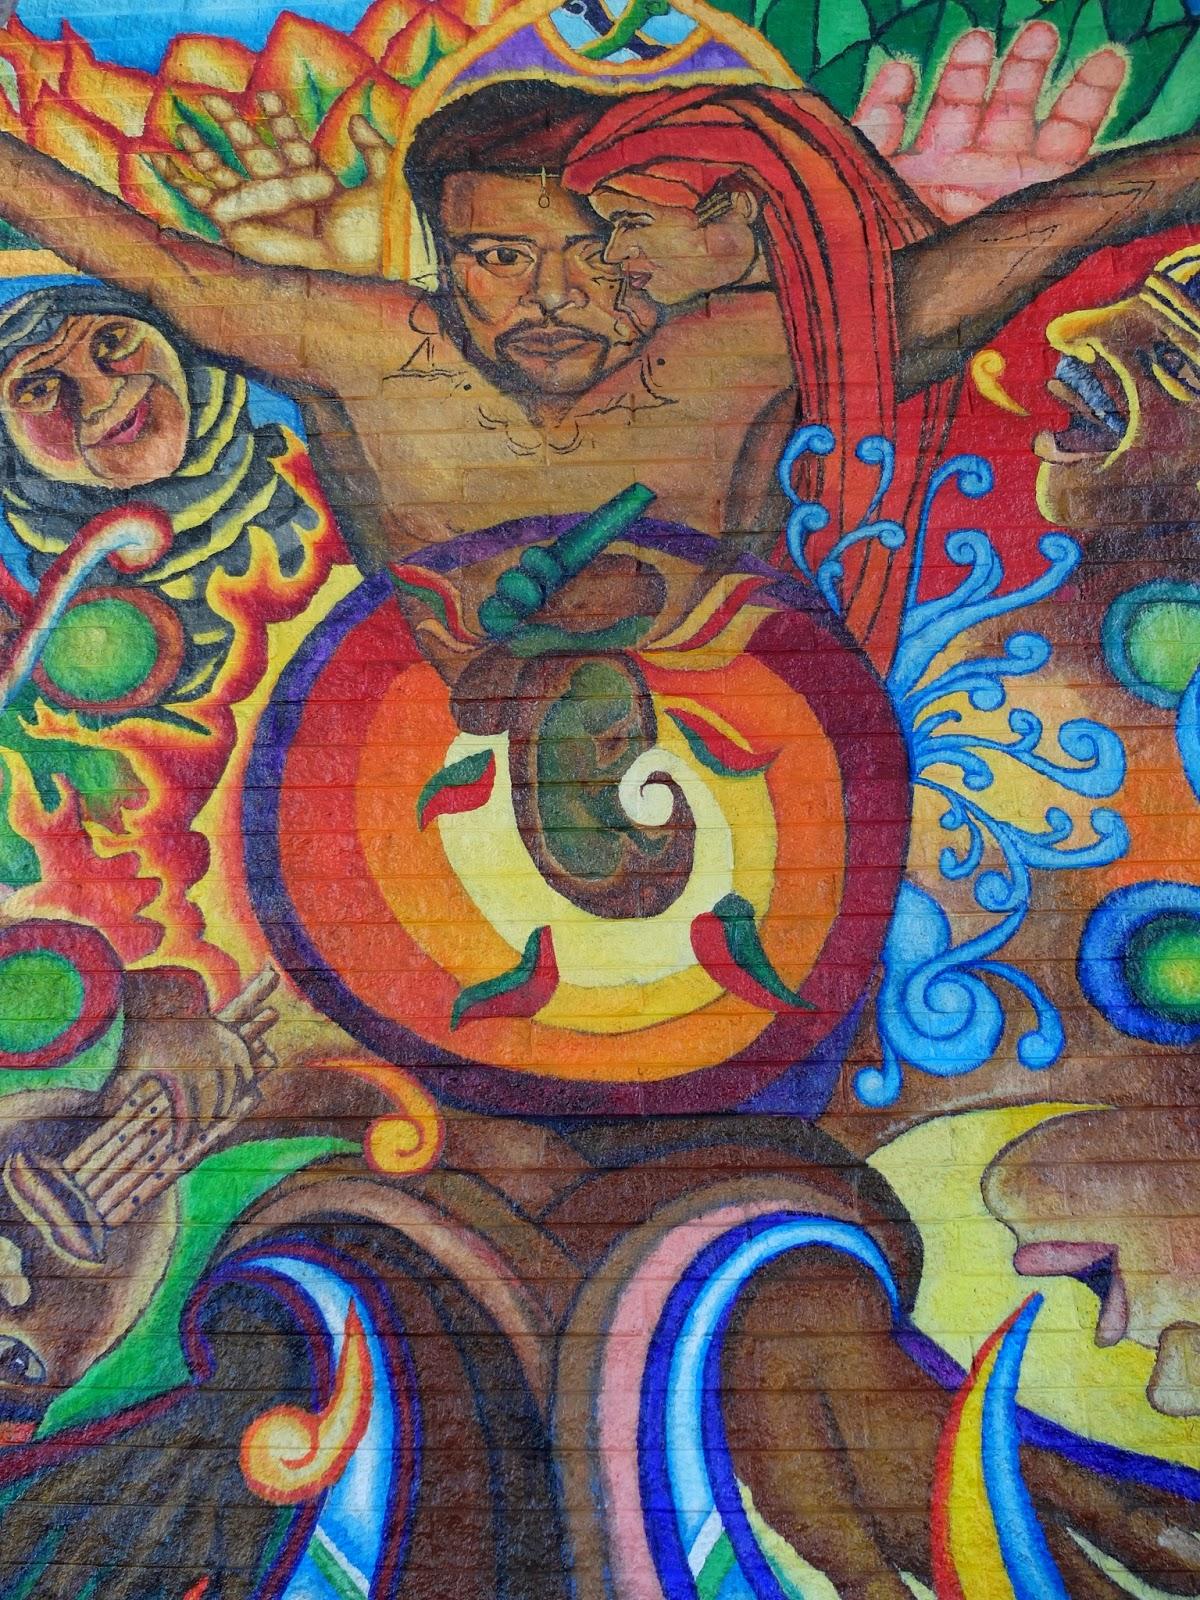 Precita Eyes Murals Tour